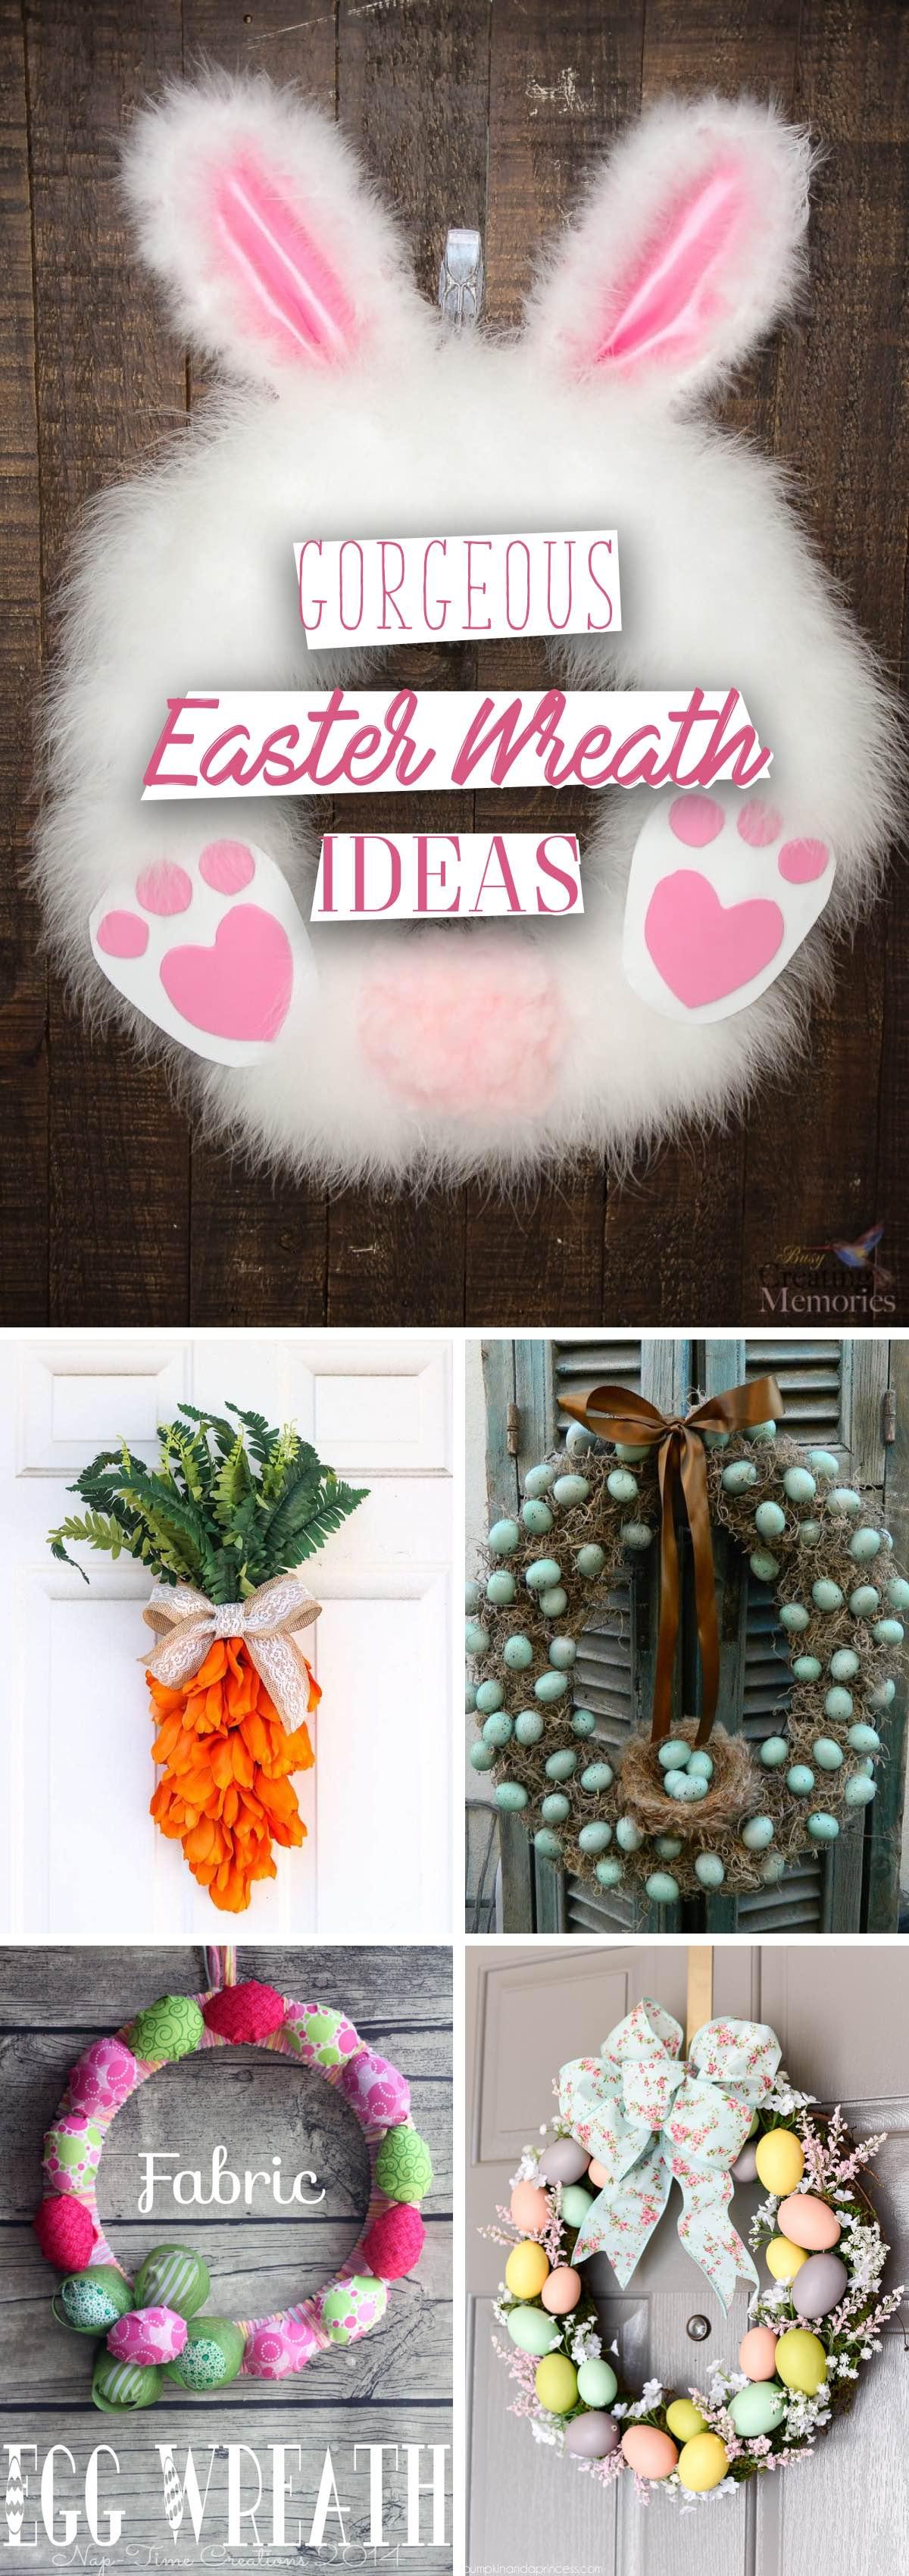 Gorgeous Easter Wreath Ideas